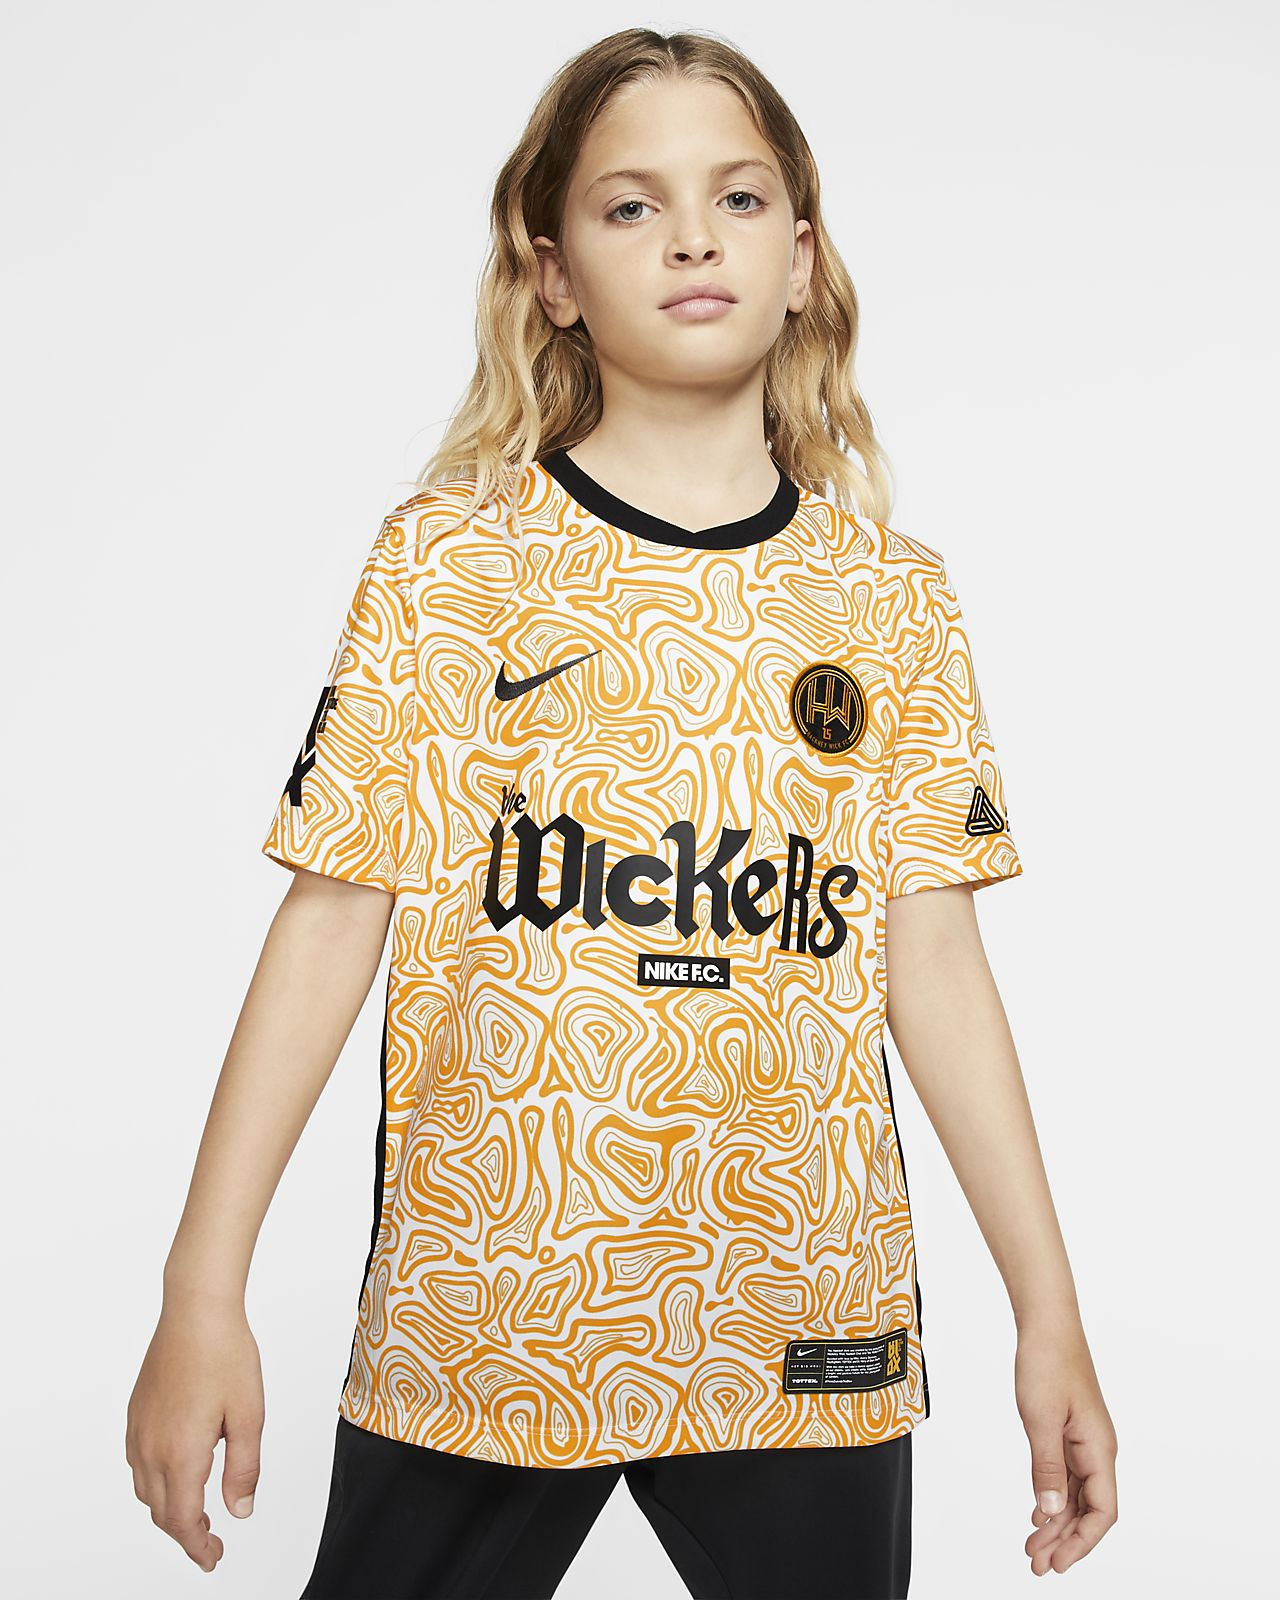 Hackney Wick FC Away Fußballtrikot für ältere Kinder